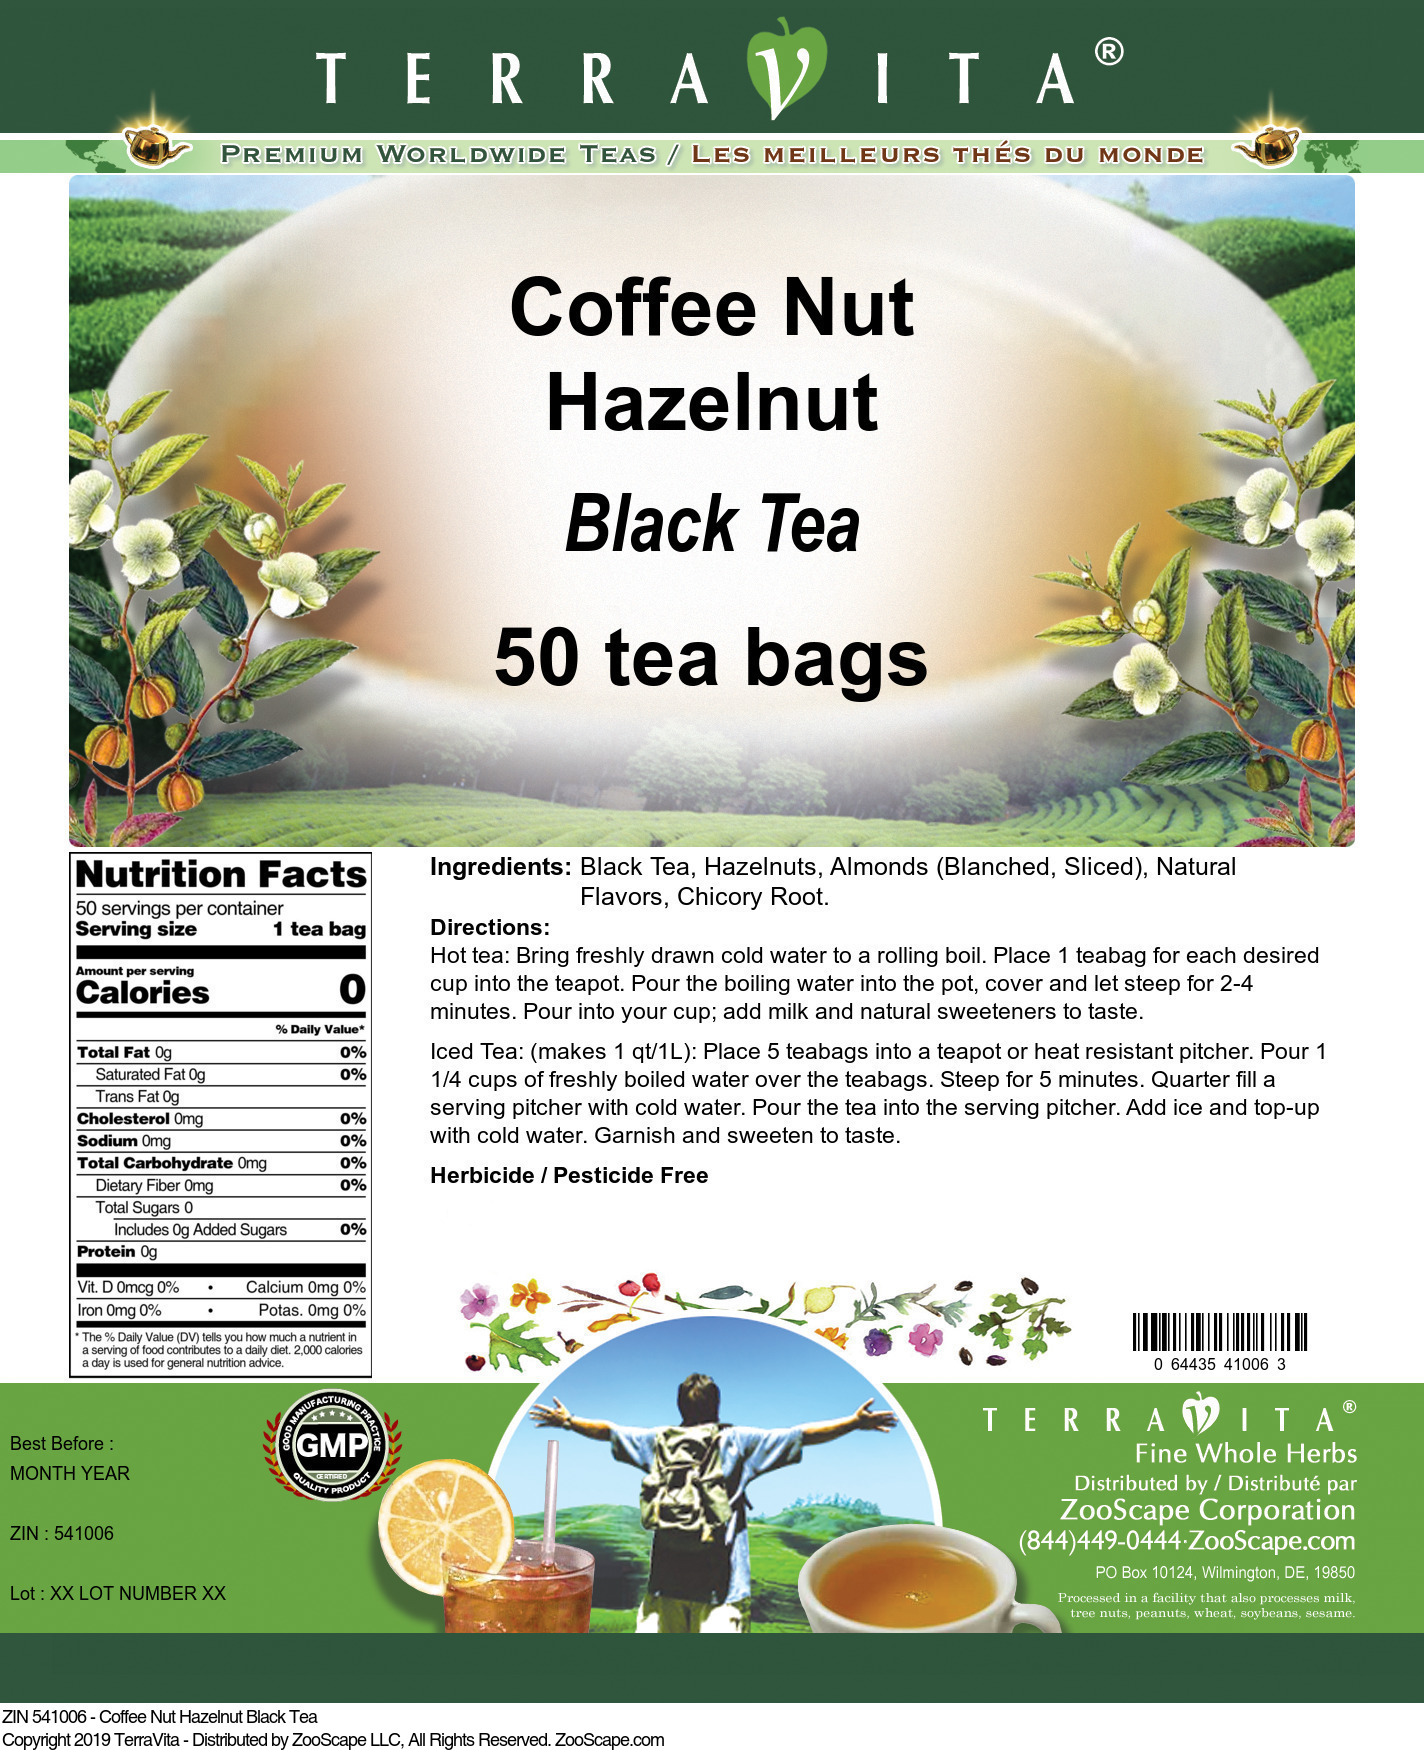 Coffee Nut Hazelnut Black Tea